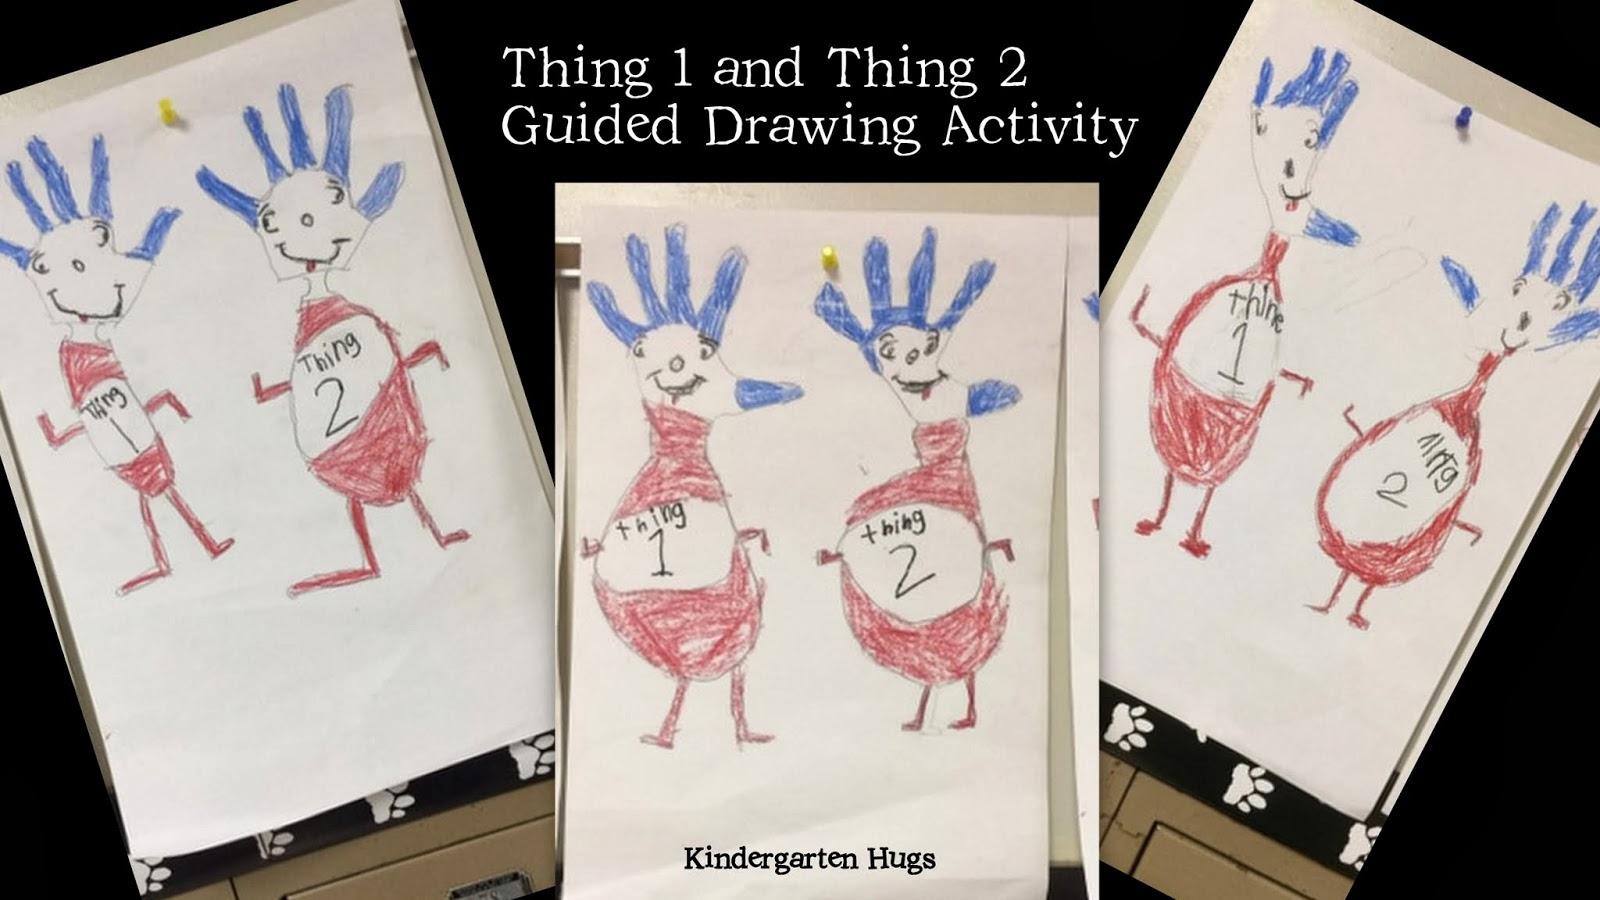 http://www.teacherspayteachers.com/Product/Seuss-Inspired-Guided-Drawing-1137281